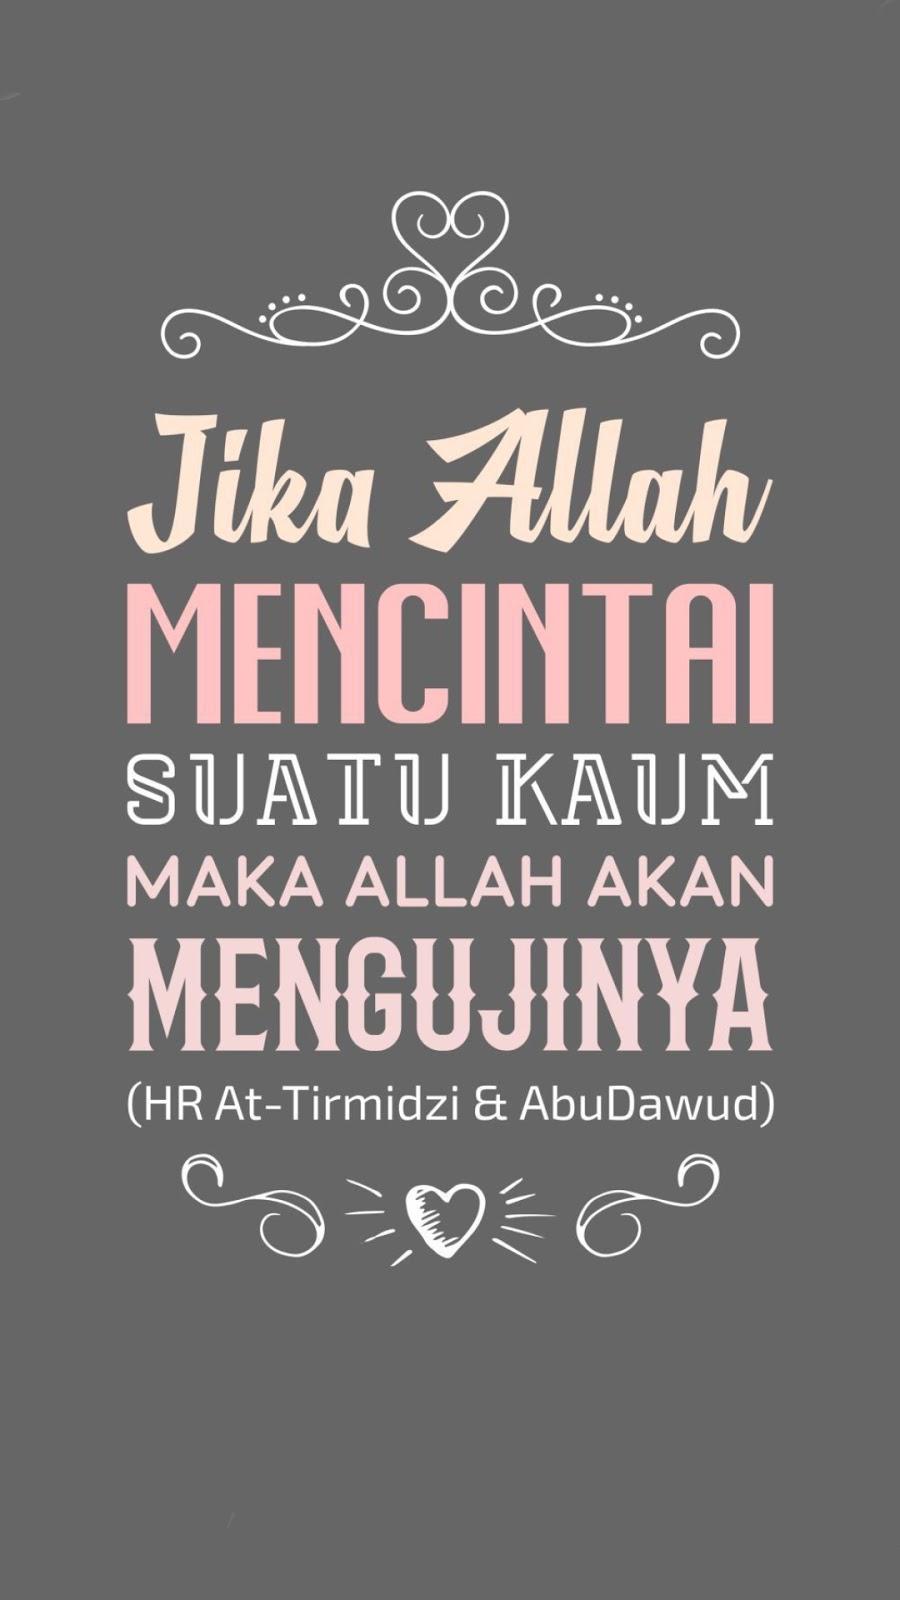 Wallpaper Ramadhan Keren Untuk HP Ukuran HD kepribadian keren dan bertaqwa kepada Allah